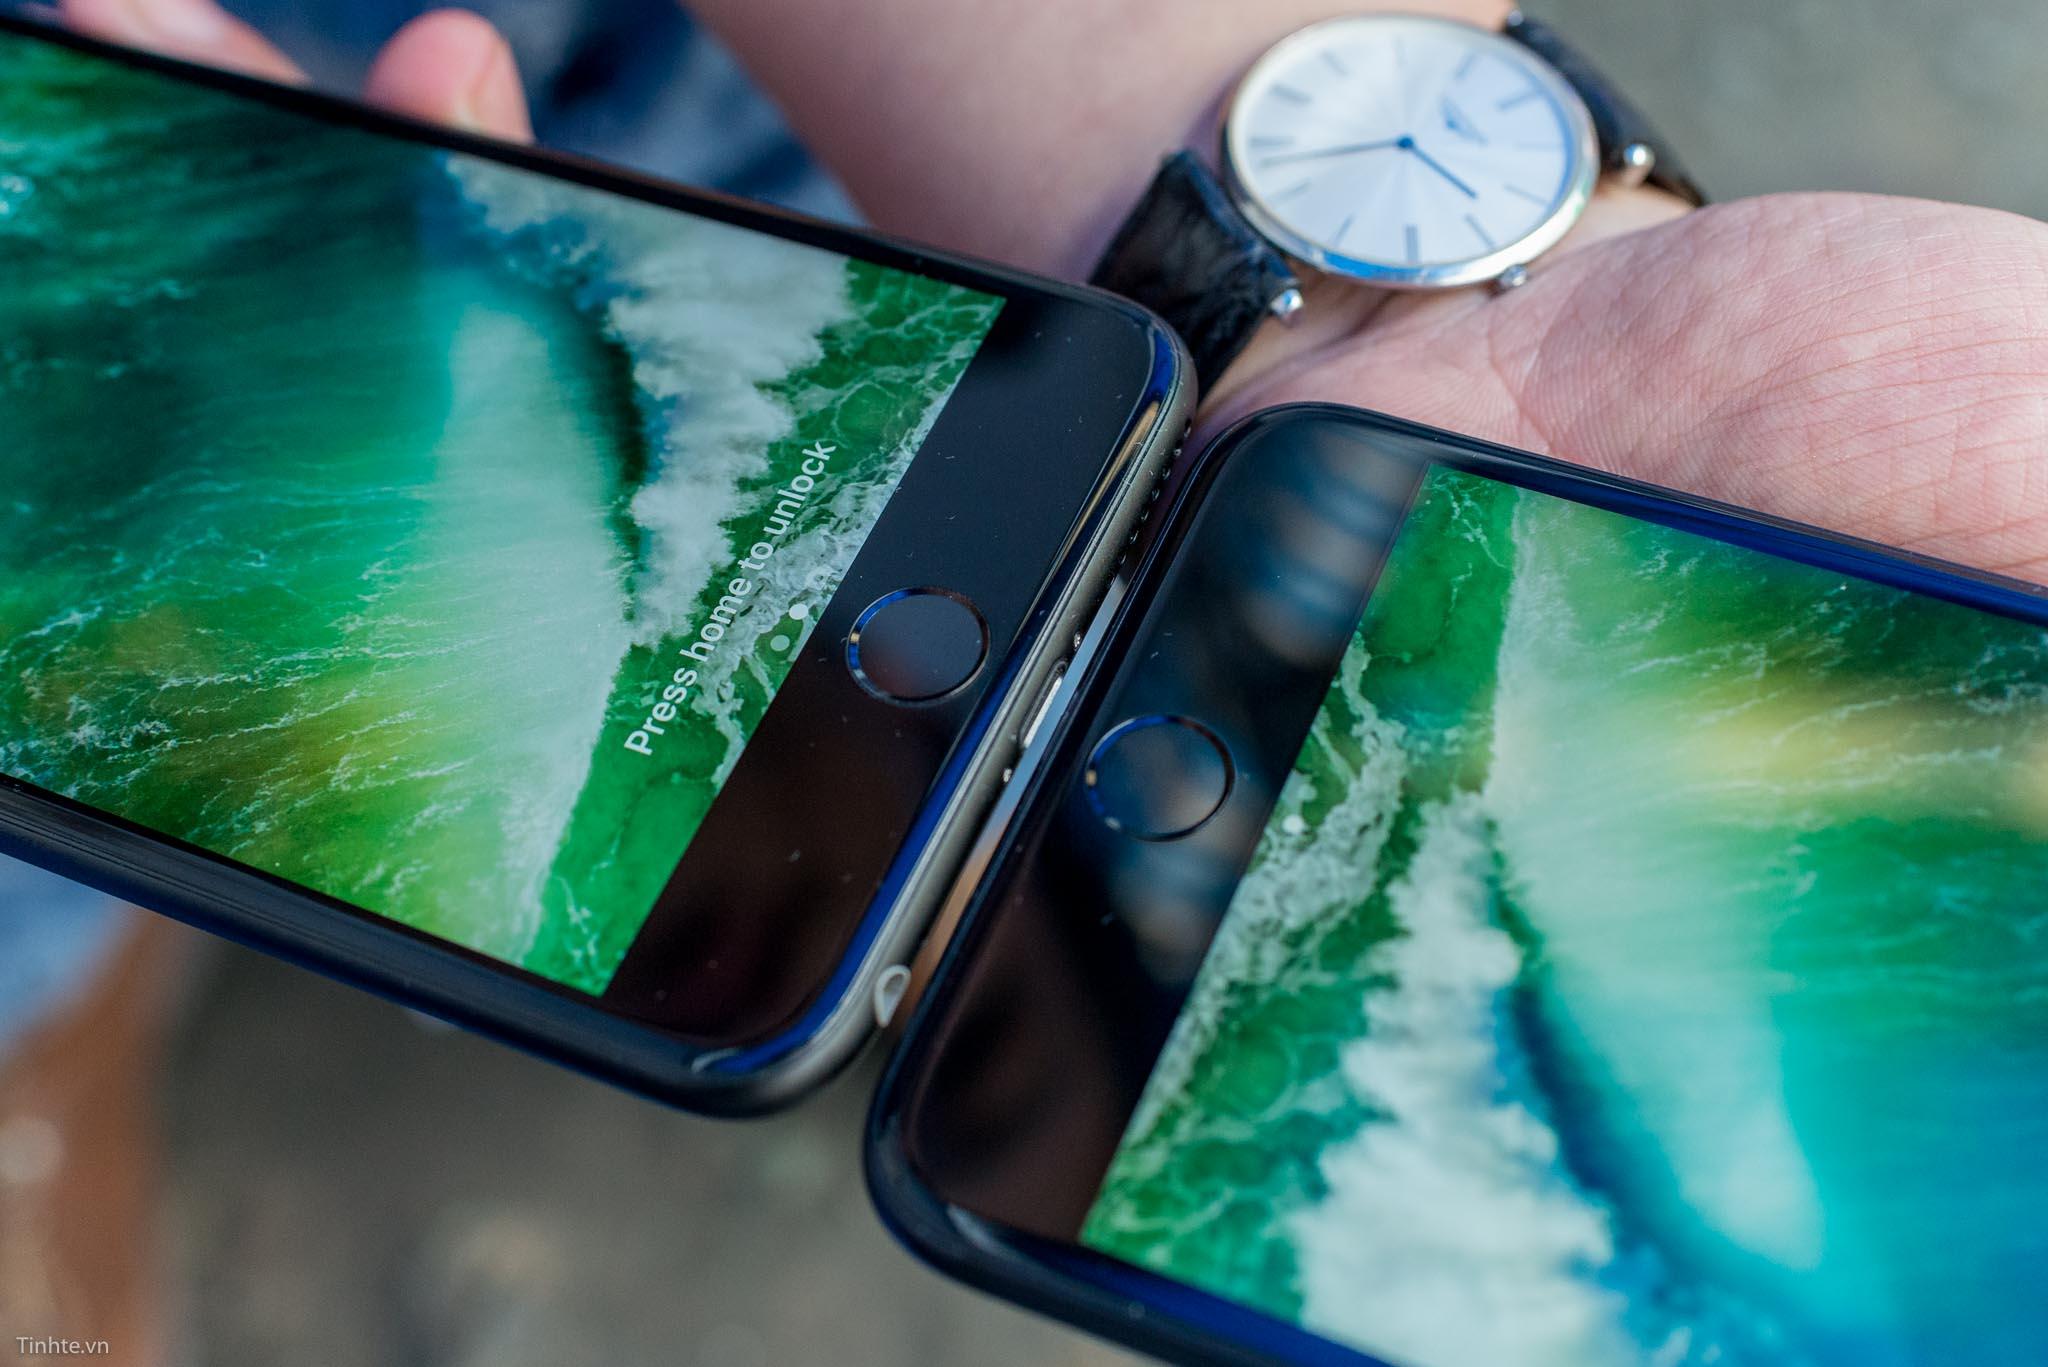 iphone-7-plus-len-vo-tinhte-26.jpg